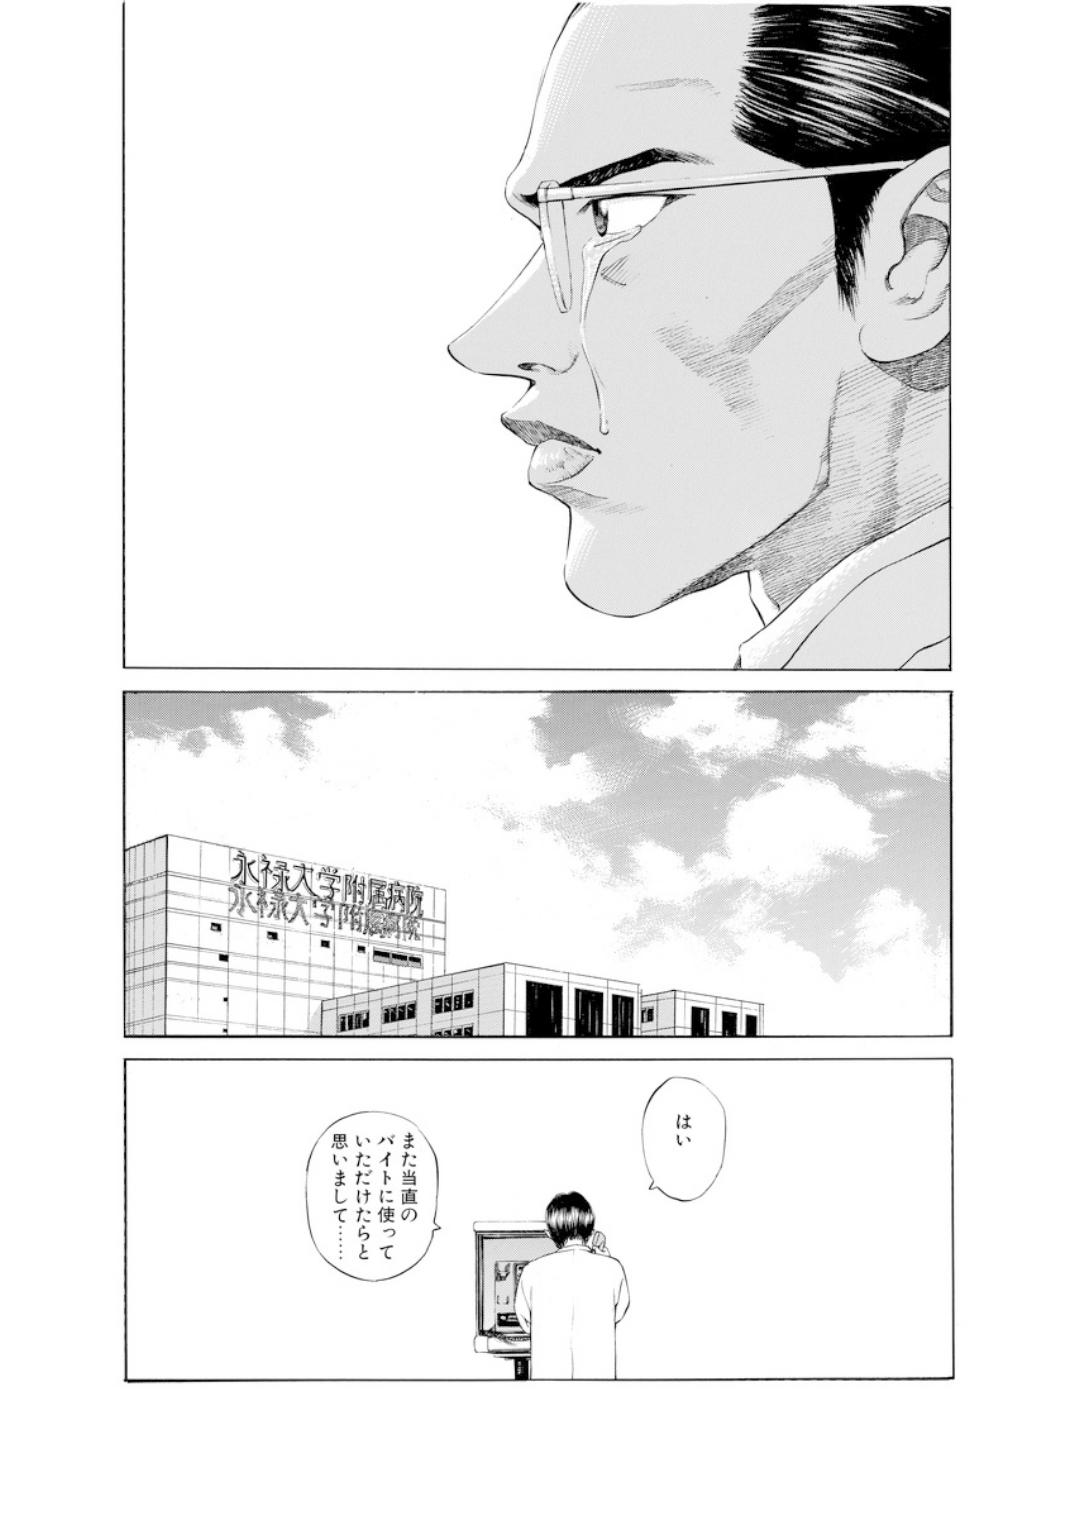 001bj_page-0142.jpg